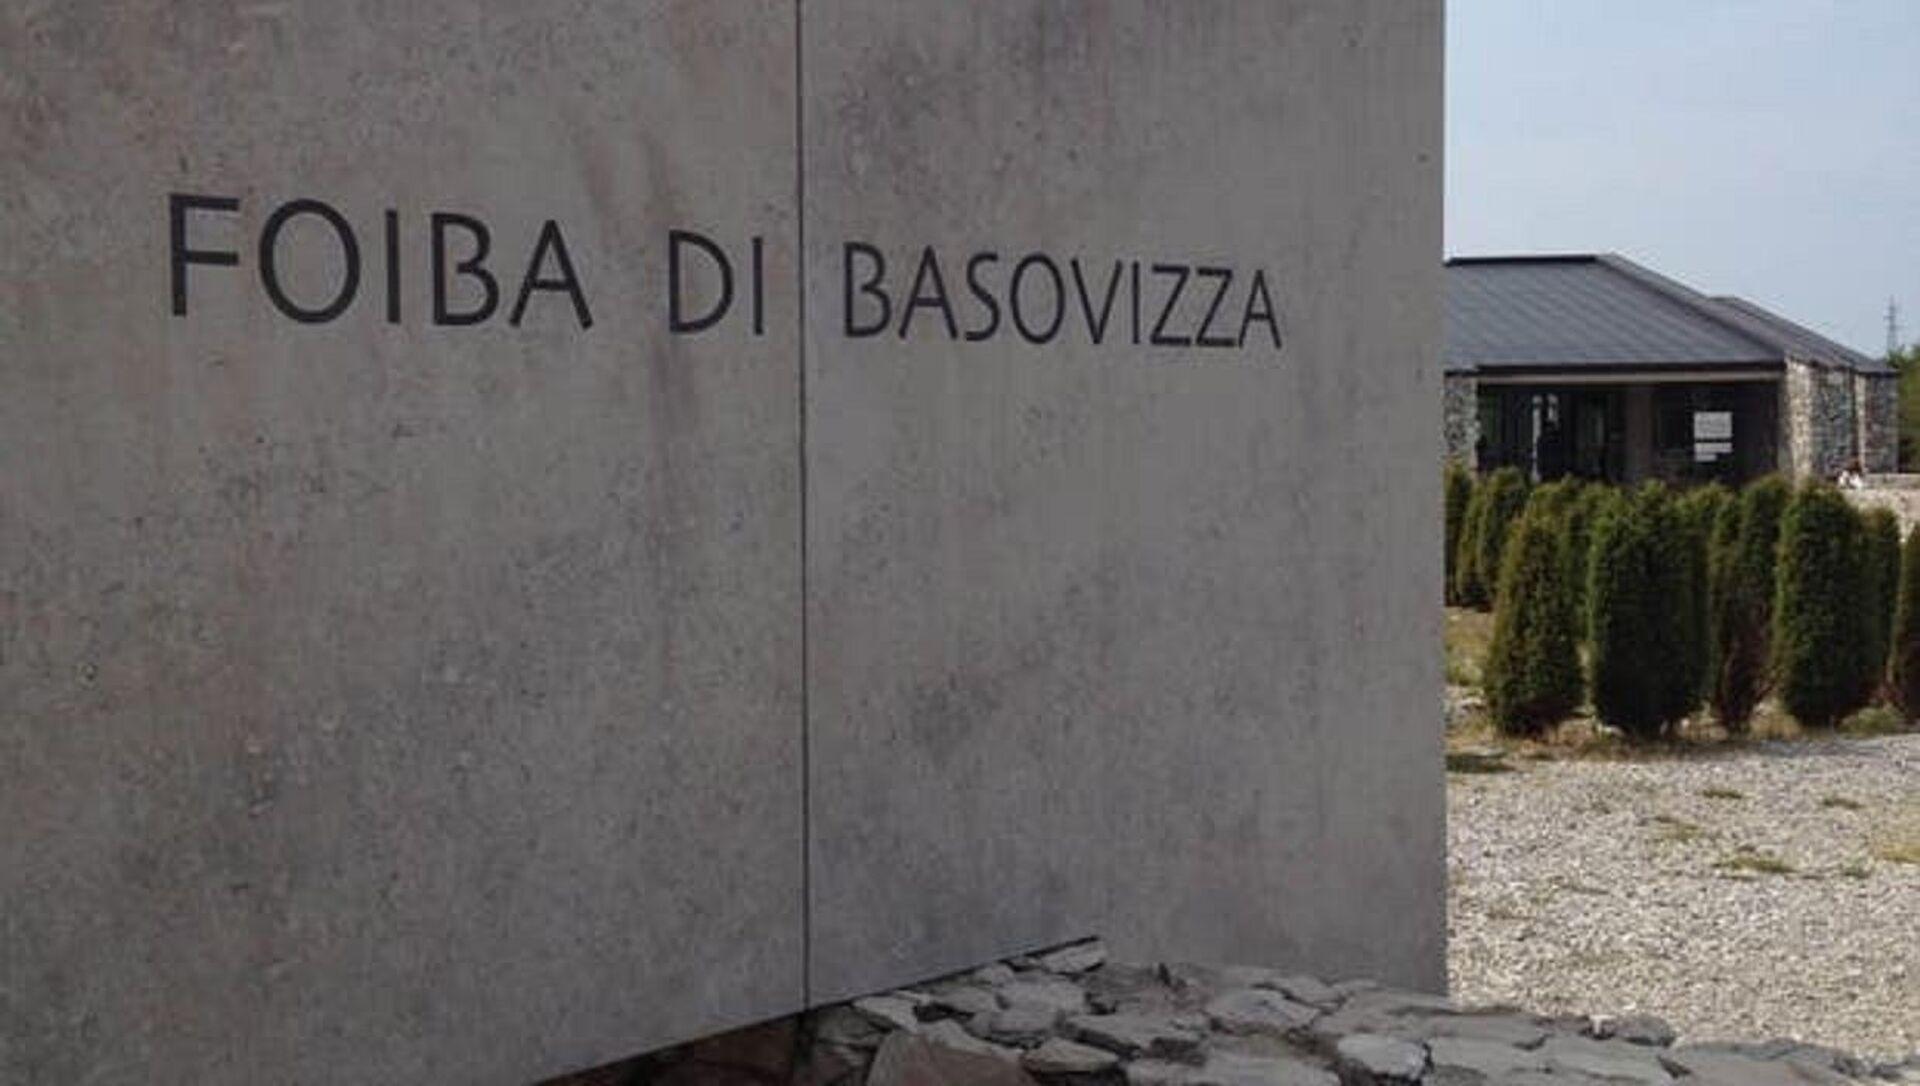 Sacrario della Foiba di Basovizza - Sputnik Italia, 1920, 10.02.2021